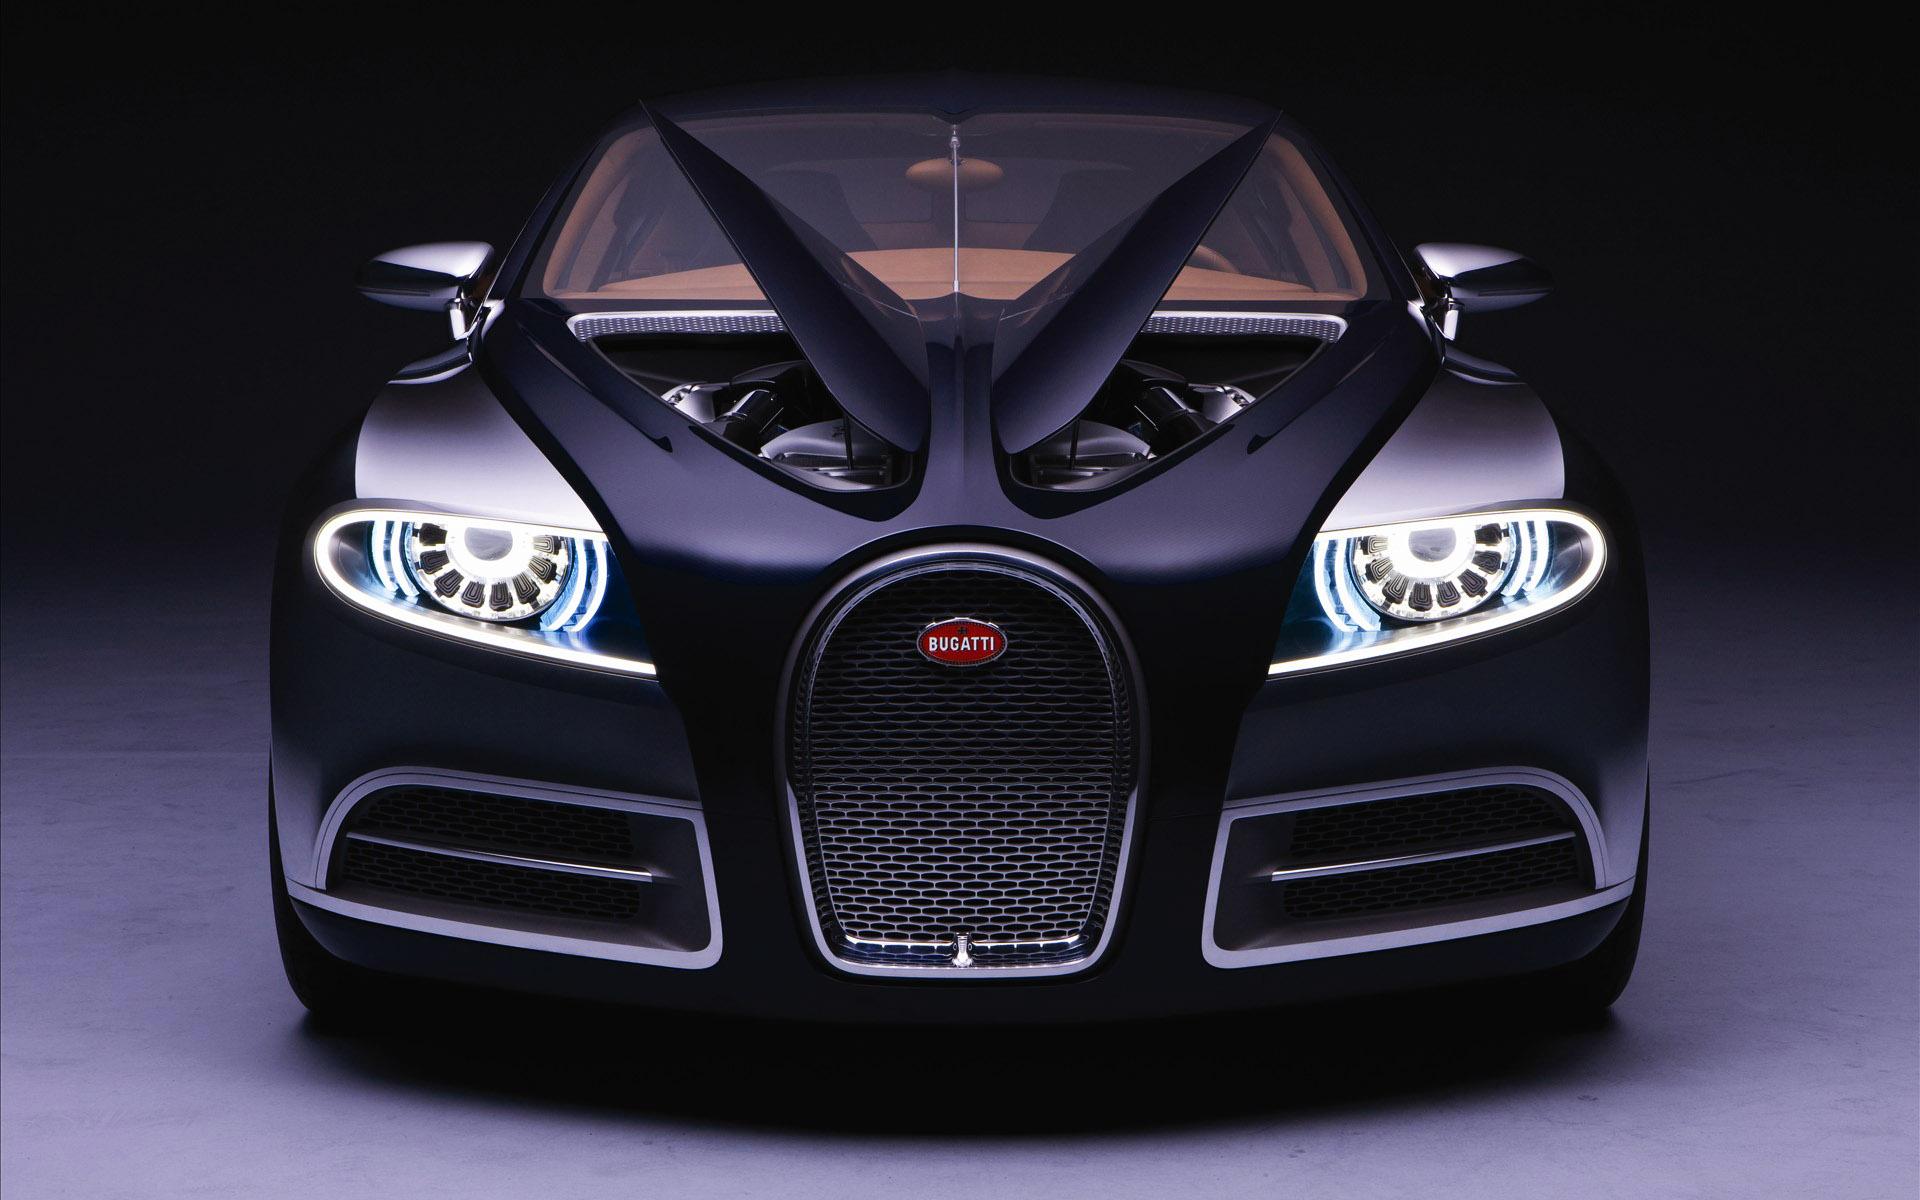 Bugatti-Veyron-http-www-firsthd-com-bugatti-veyron-html-wallpaper-wp5204902